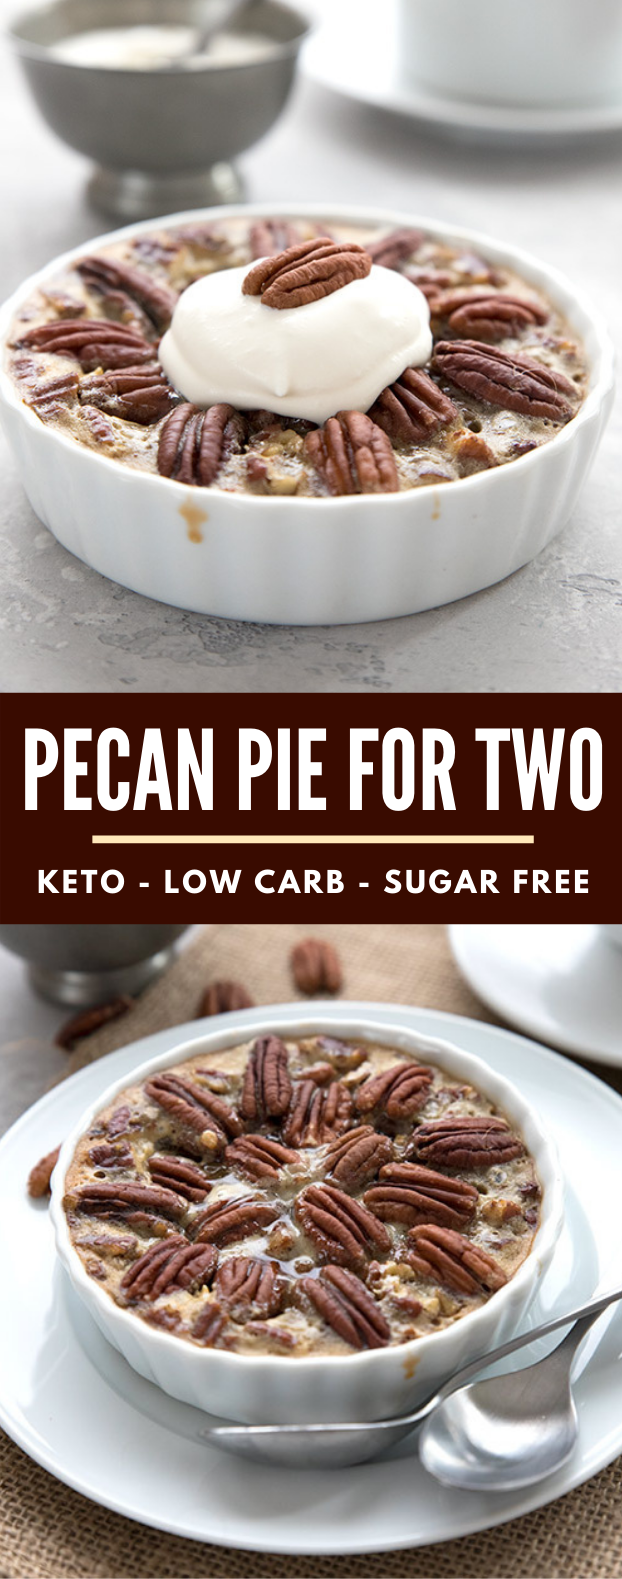 KETO PECAN PIE FOR TWO #healthy #lowcarb  #ketogenic #diet #sugarfree